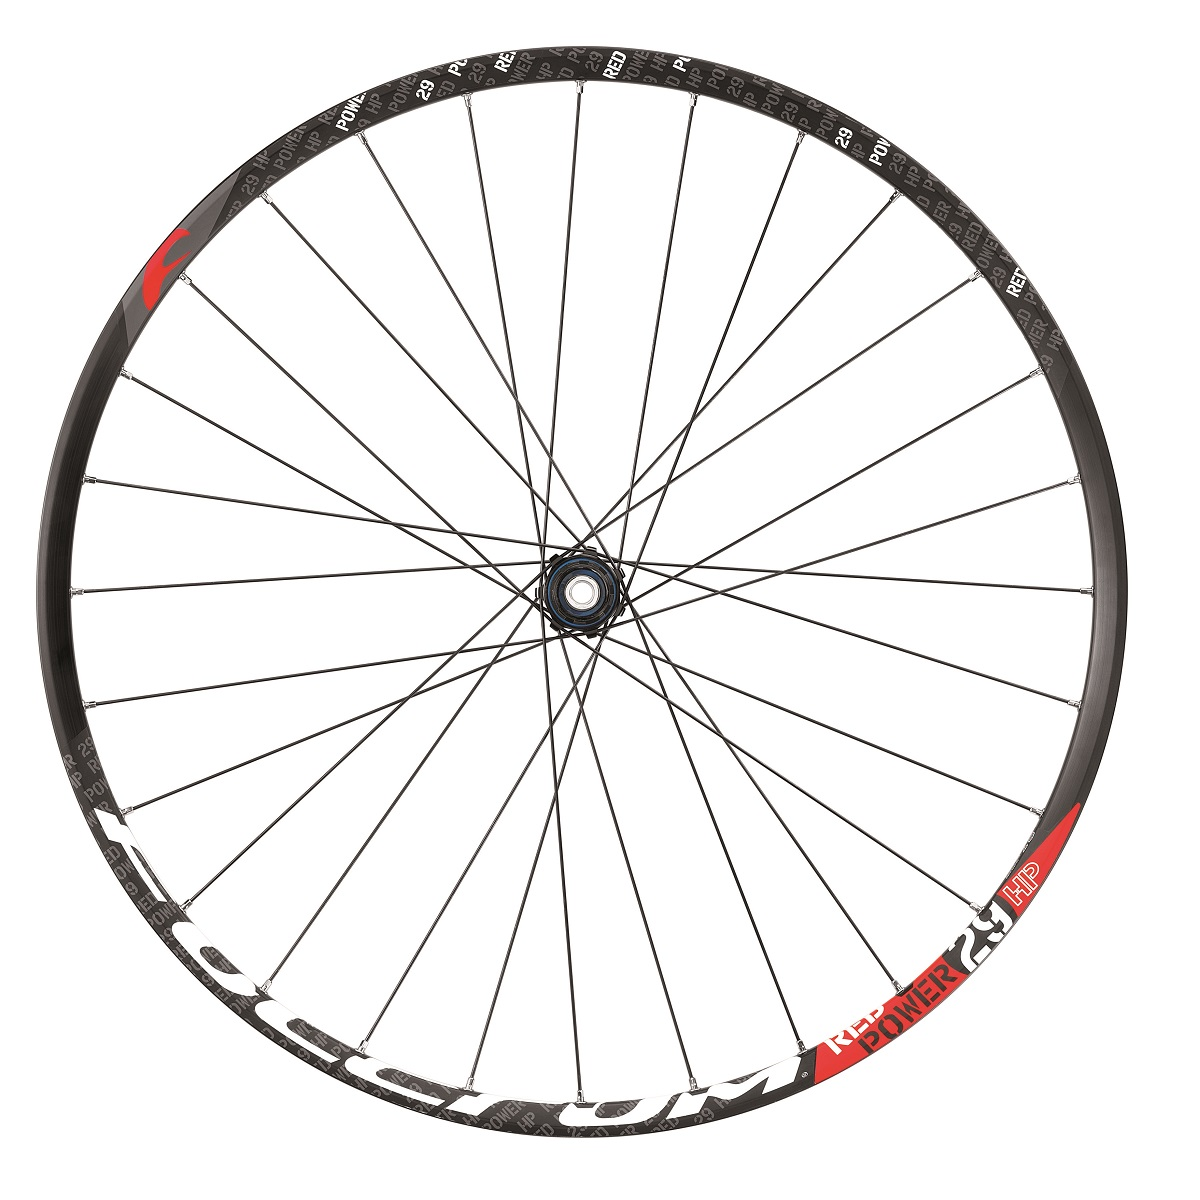 New Fulcrum Red Power Hp Wheels